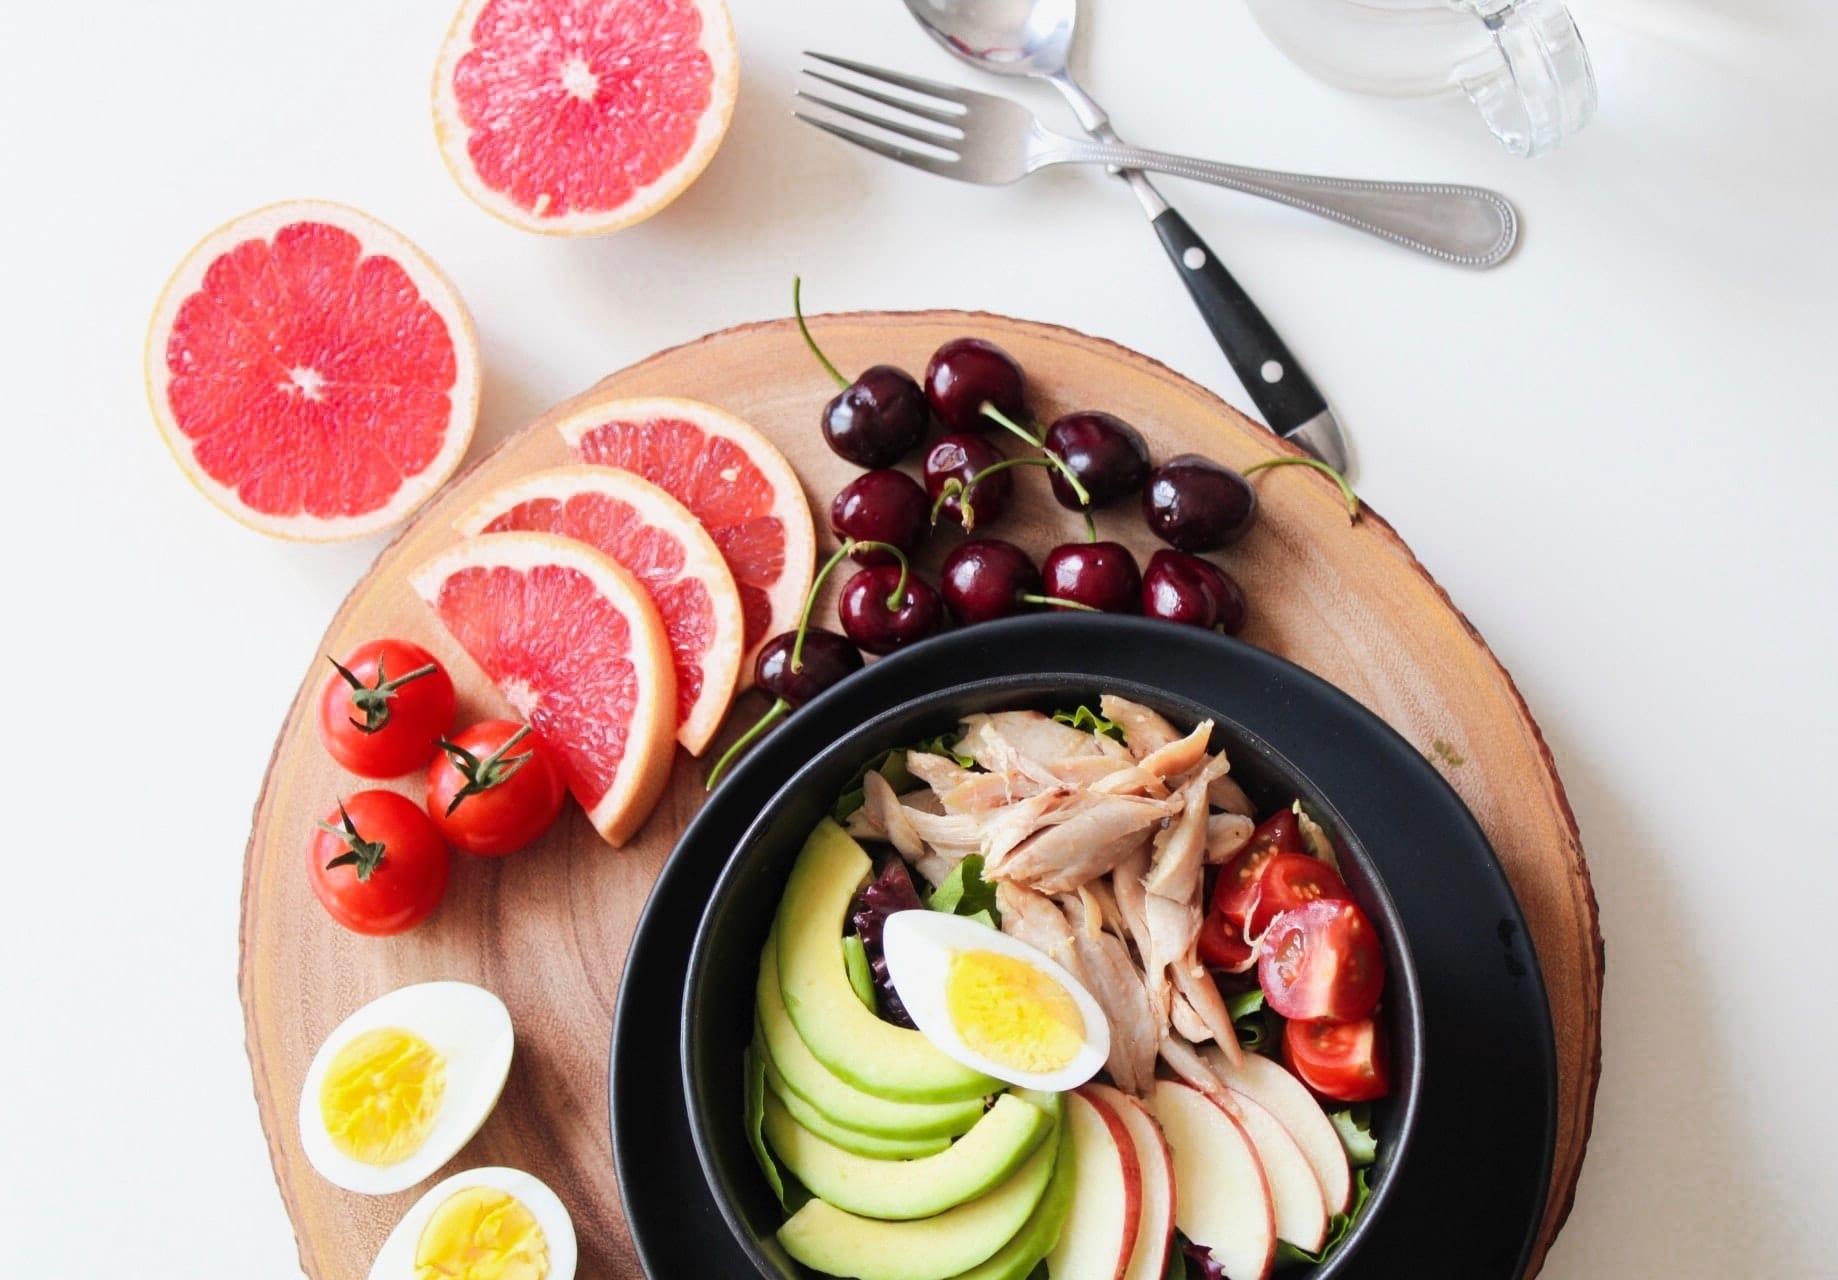 Health Meals